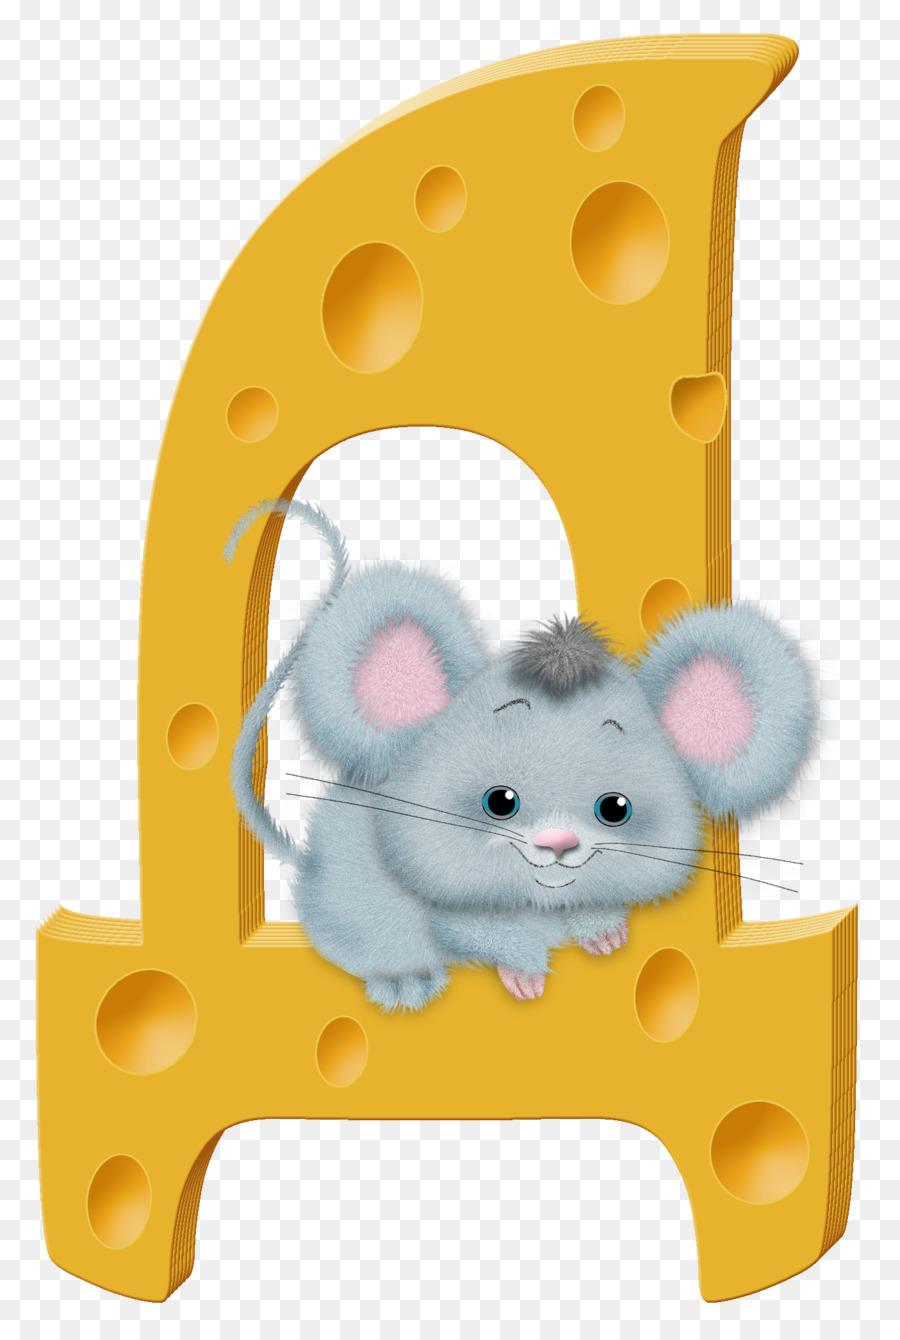 подходит картинка мышонок с цифрами праздники, многих